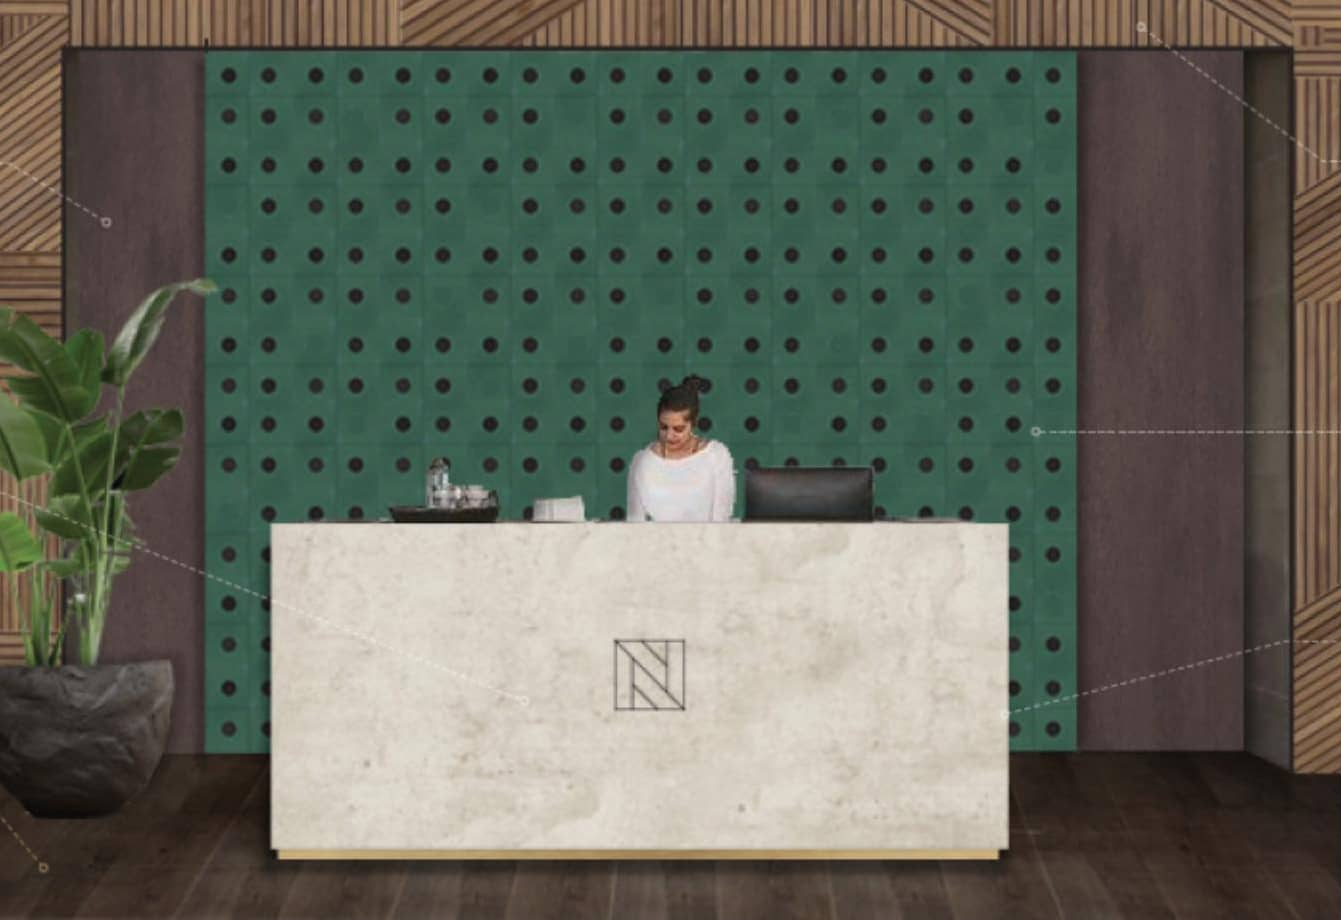 Natiivo Austin front desk and concierge service